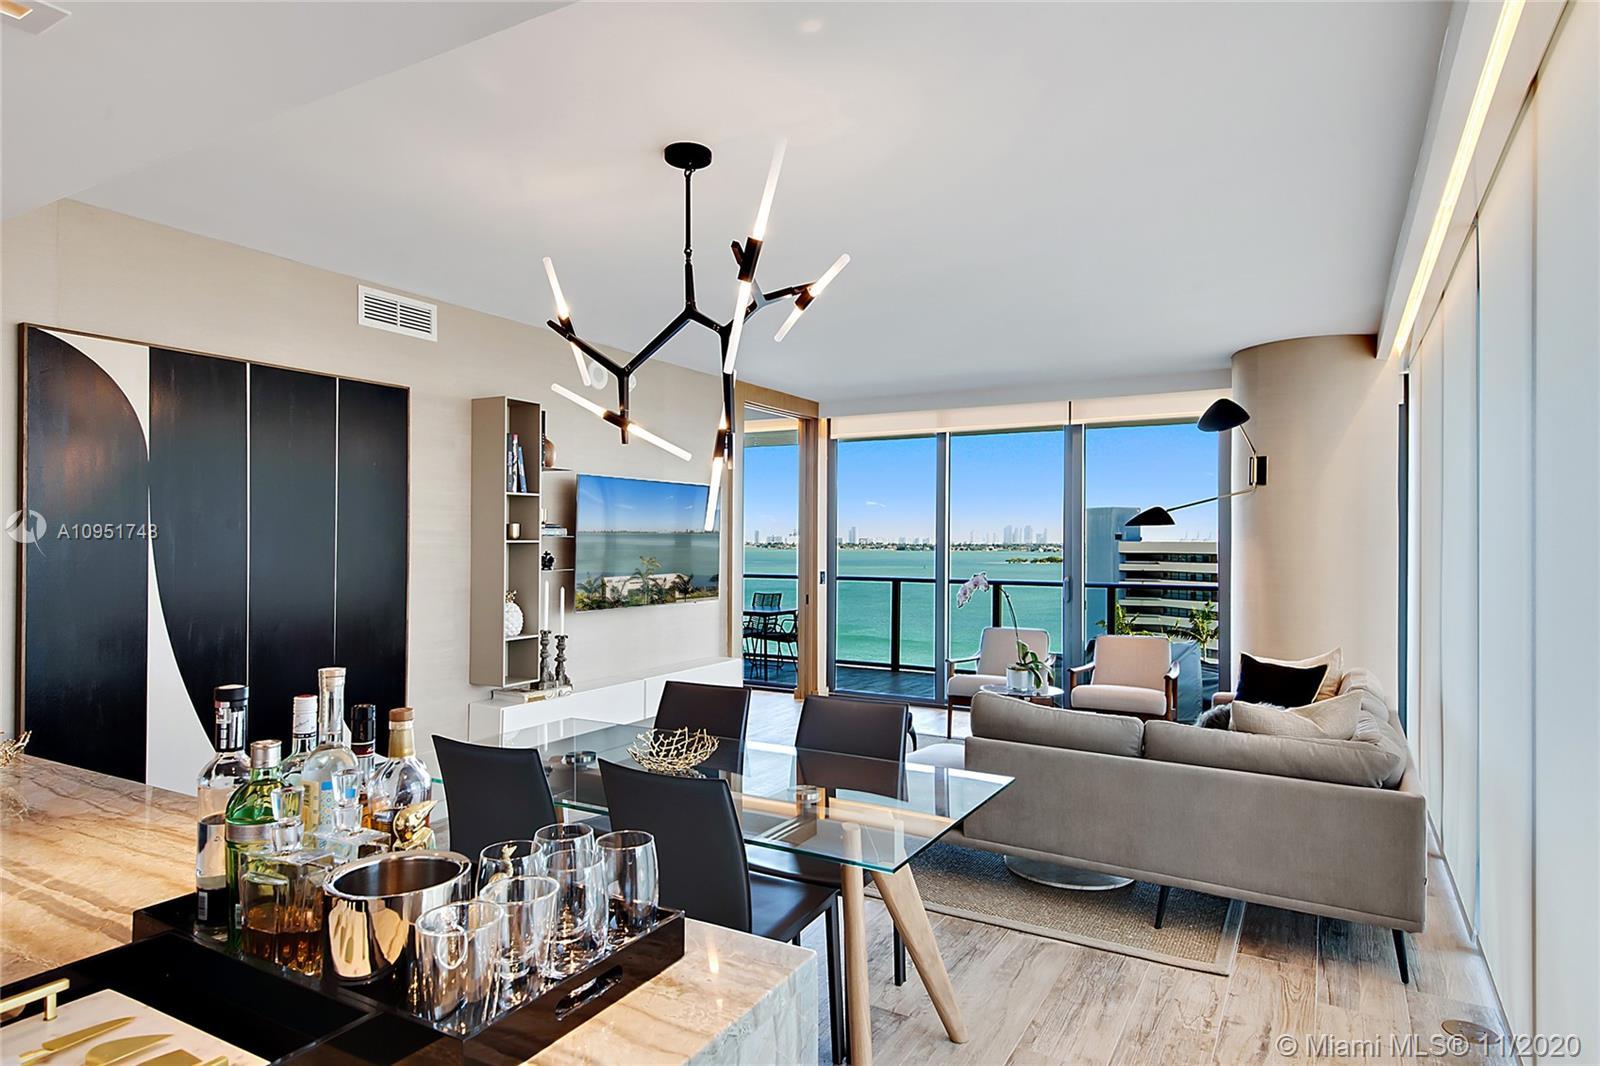 Home for sale in Paraiso Miami Florida